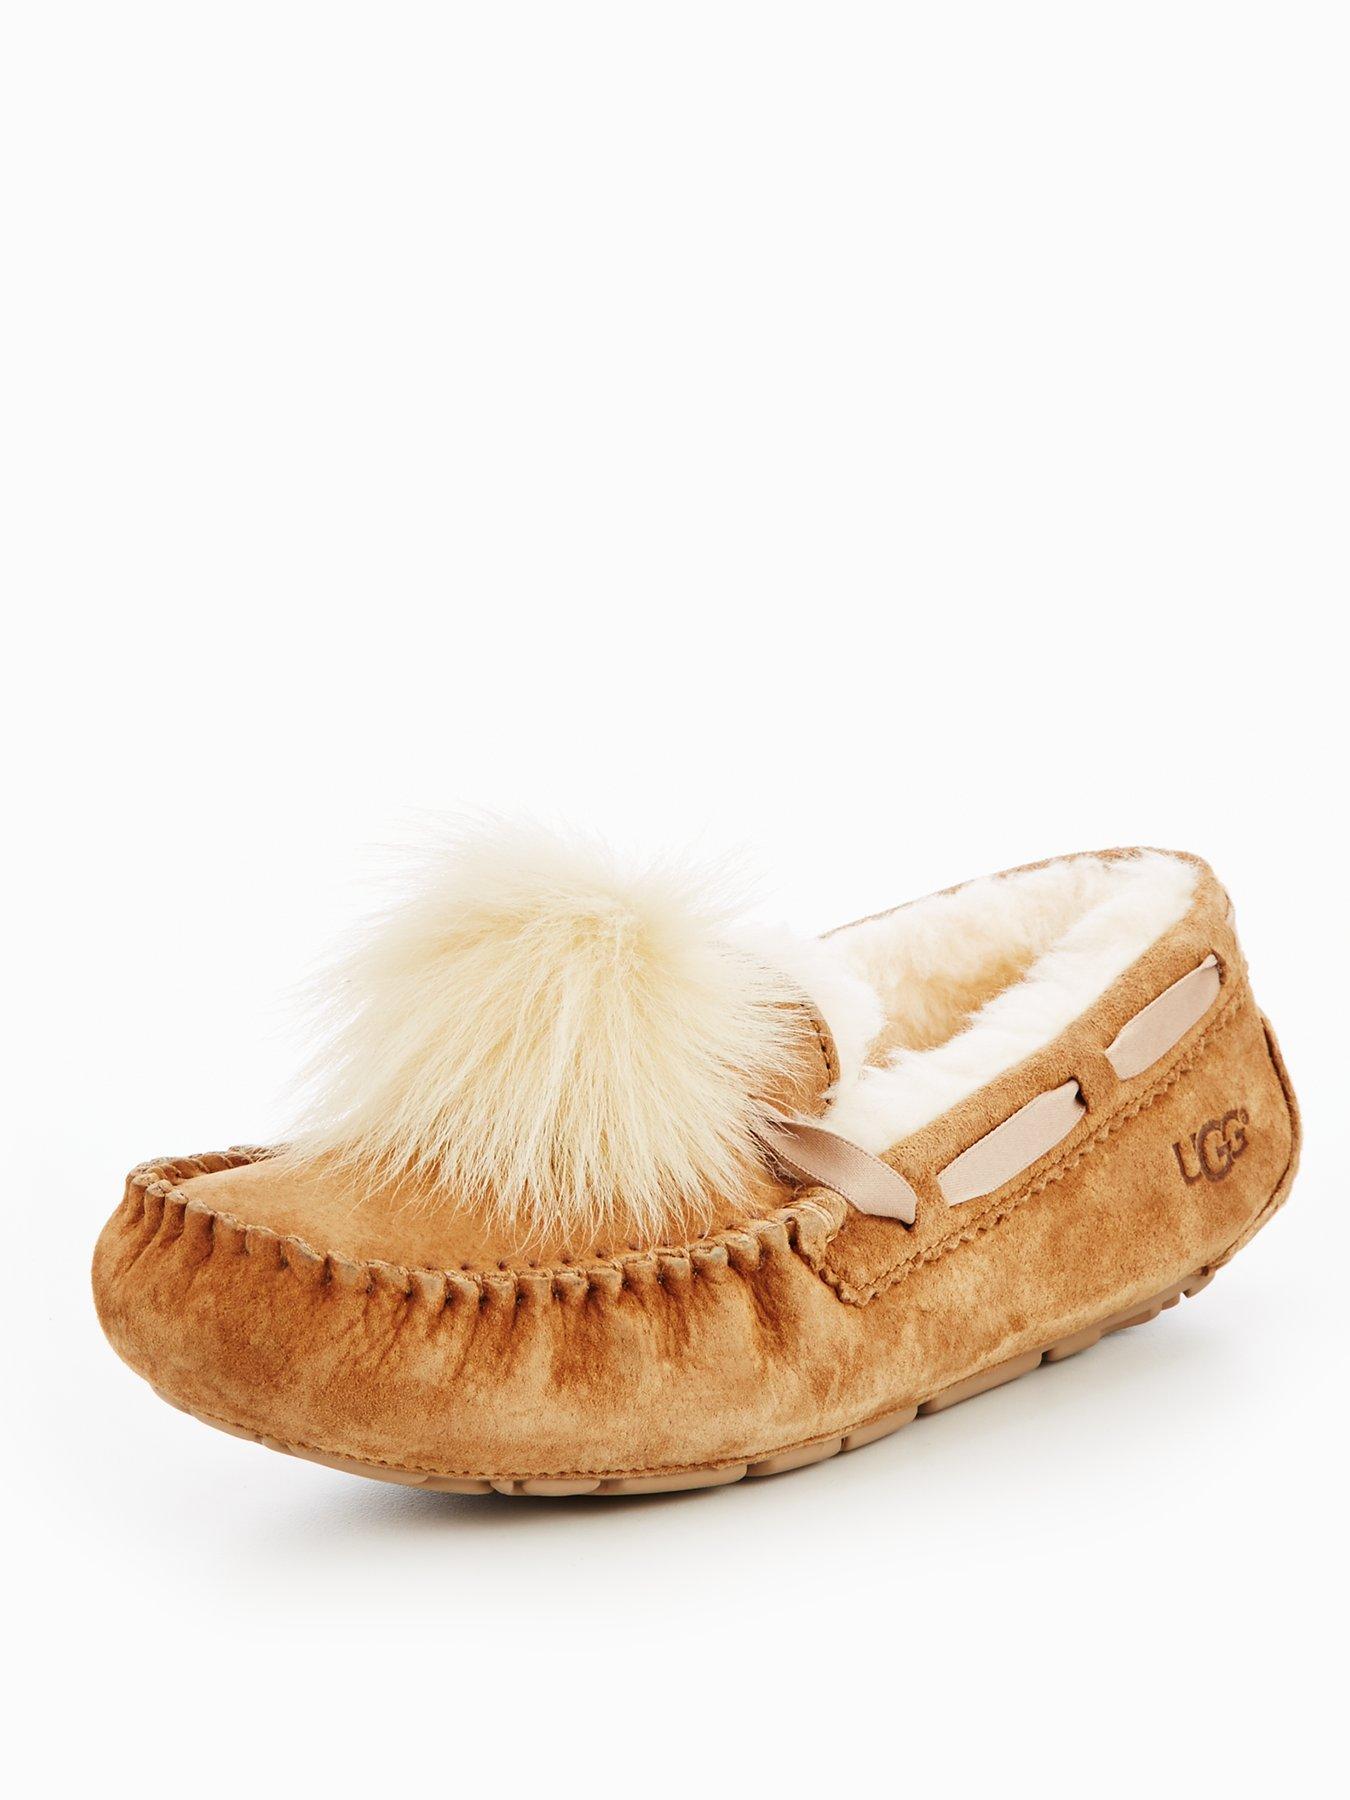 UGG Dakota Pom Pom Slipper 1600194448 Women's Shoes UGG Slippers